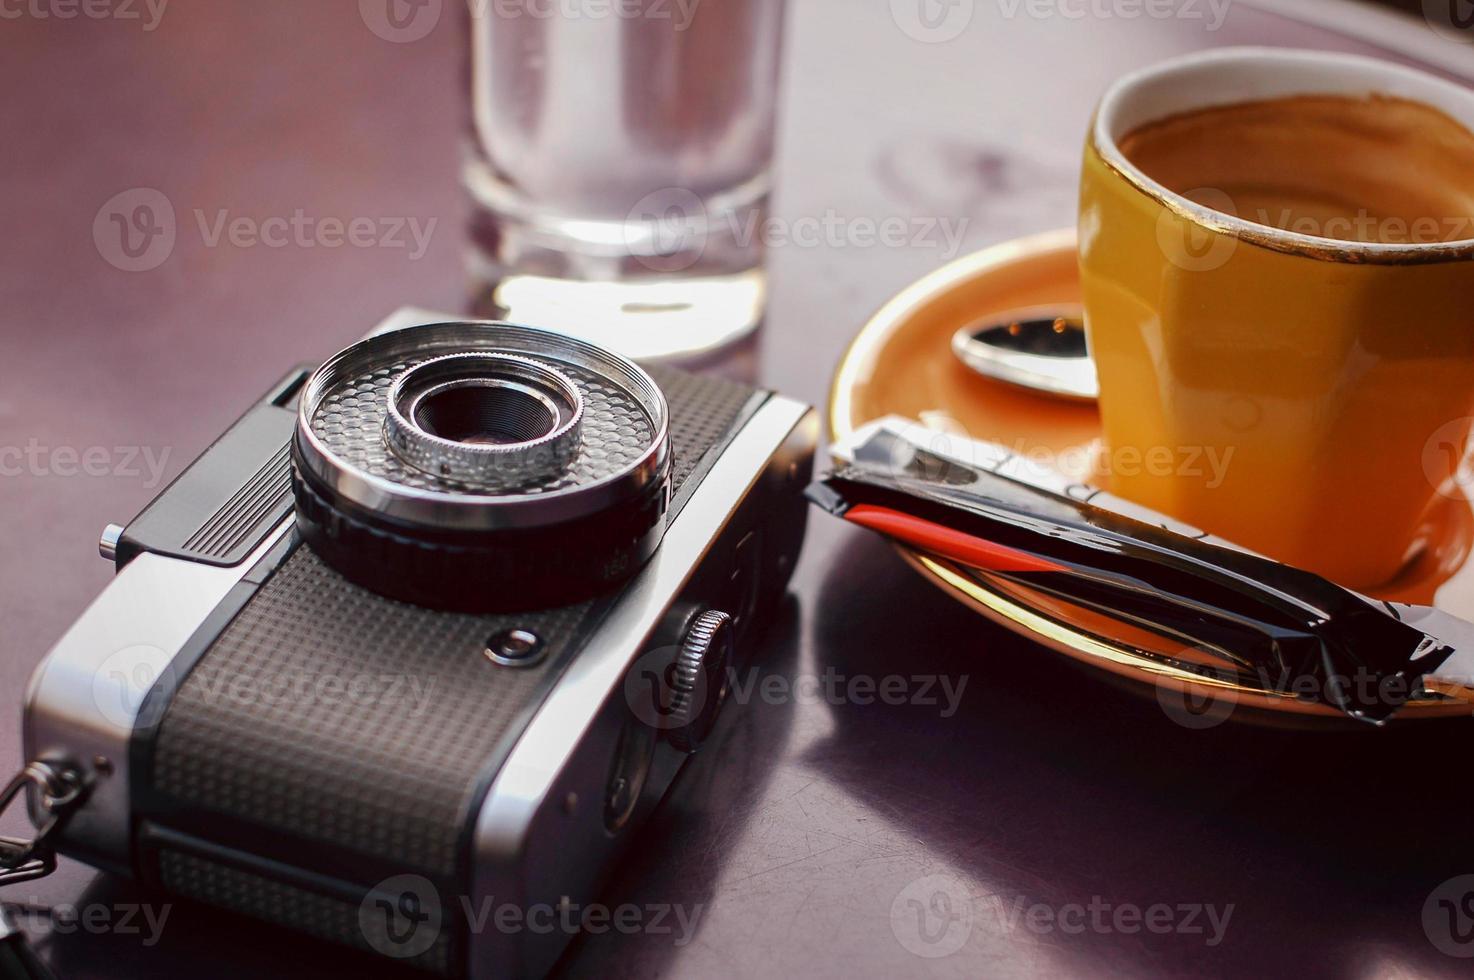 leere Tasse Kaffee und Retro-Kamera foto